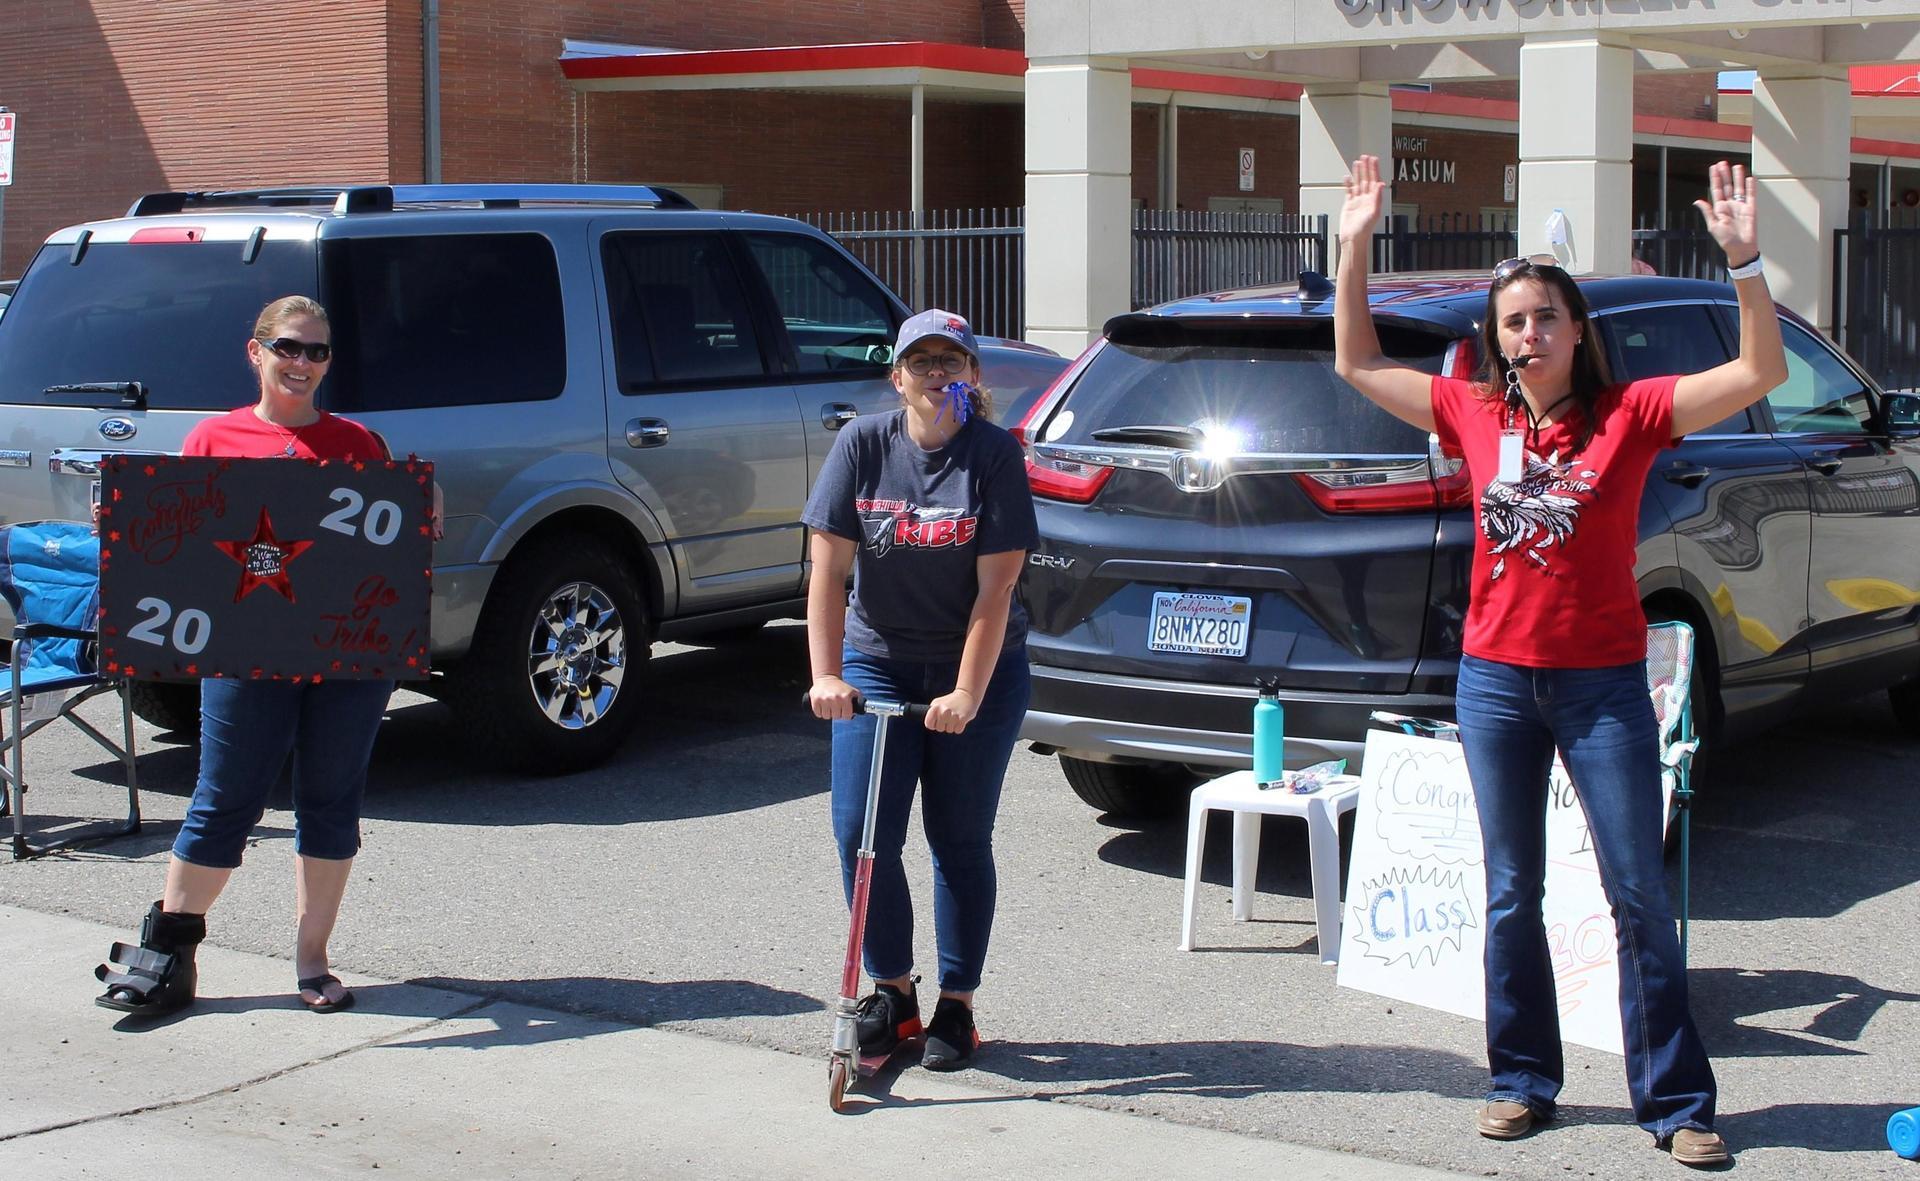 Teachers' Heather Opfergelt, Savannah Linhares, and Shane Raggio celebrating senior graduates